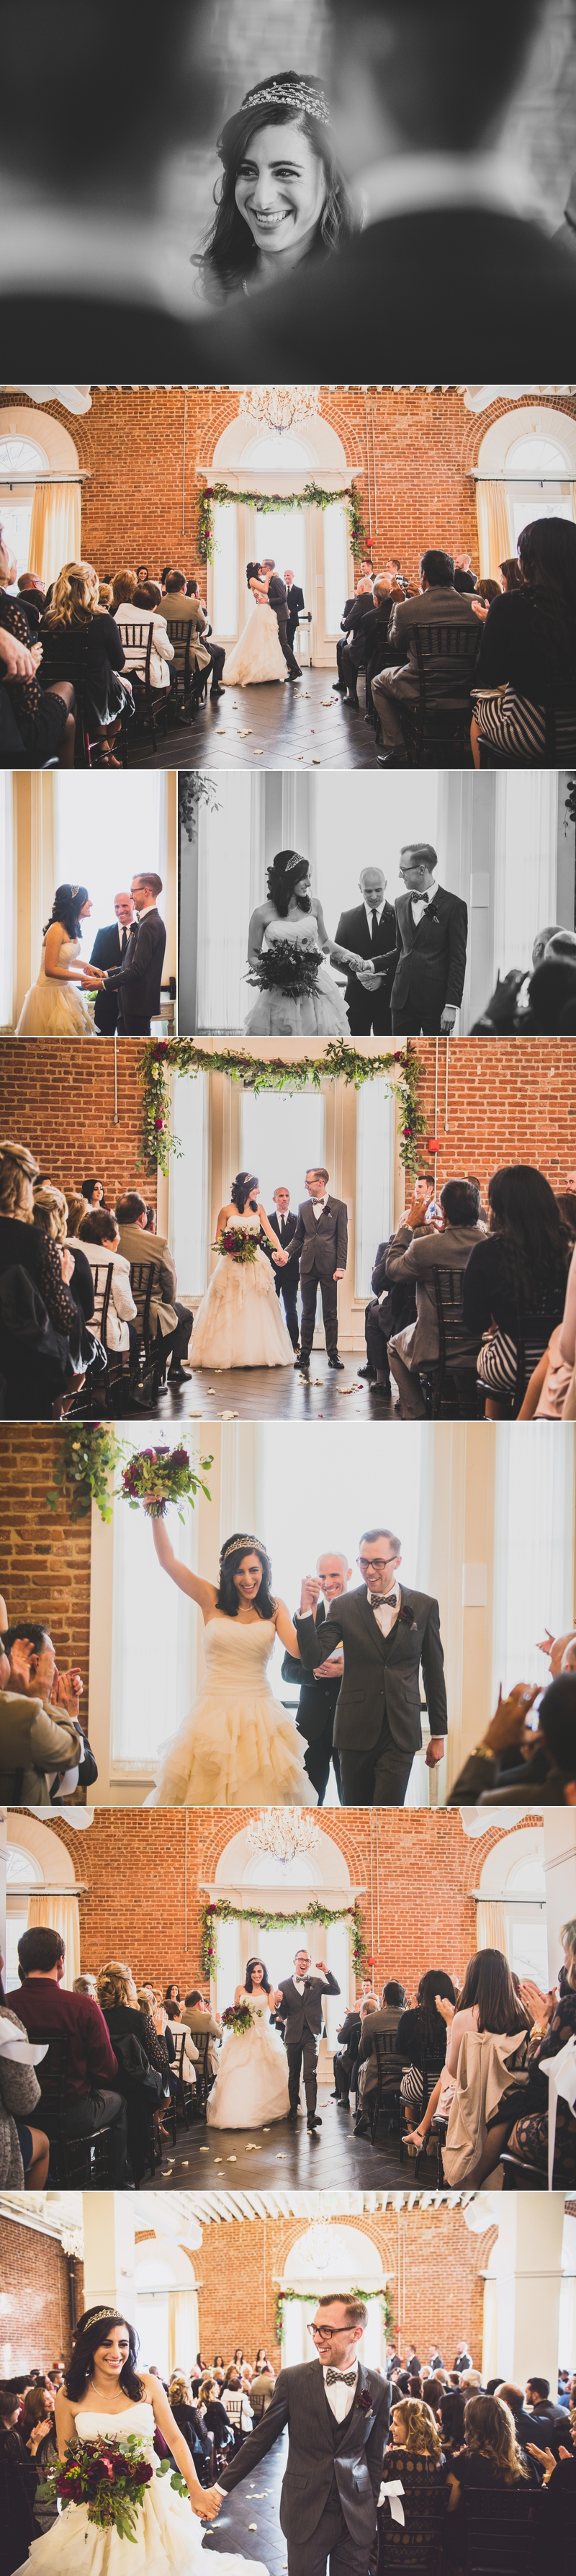 Katrina_Matt_ceremony.jpeg